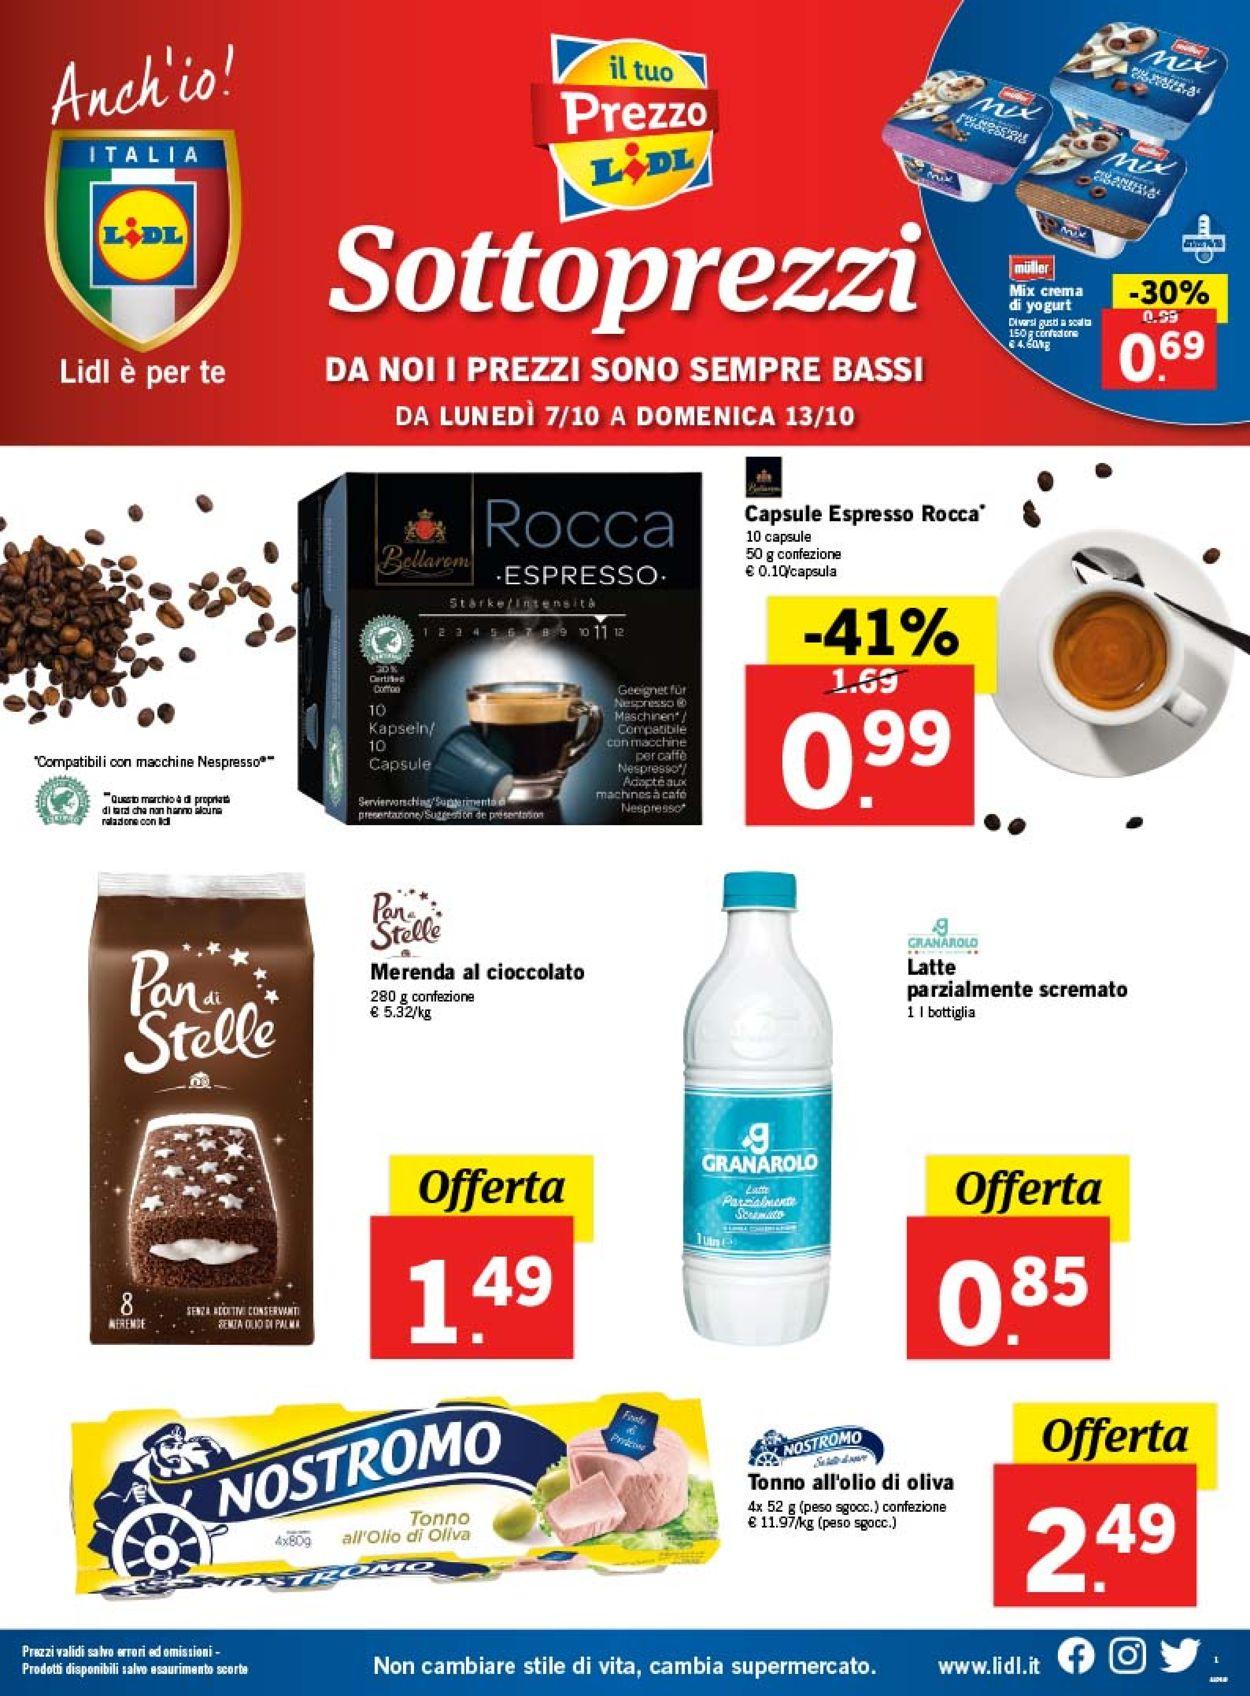 Volantino Lidl - Offerte 07/10-13/10/2019